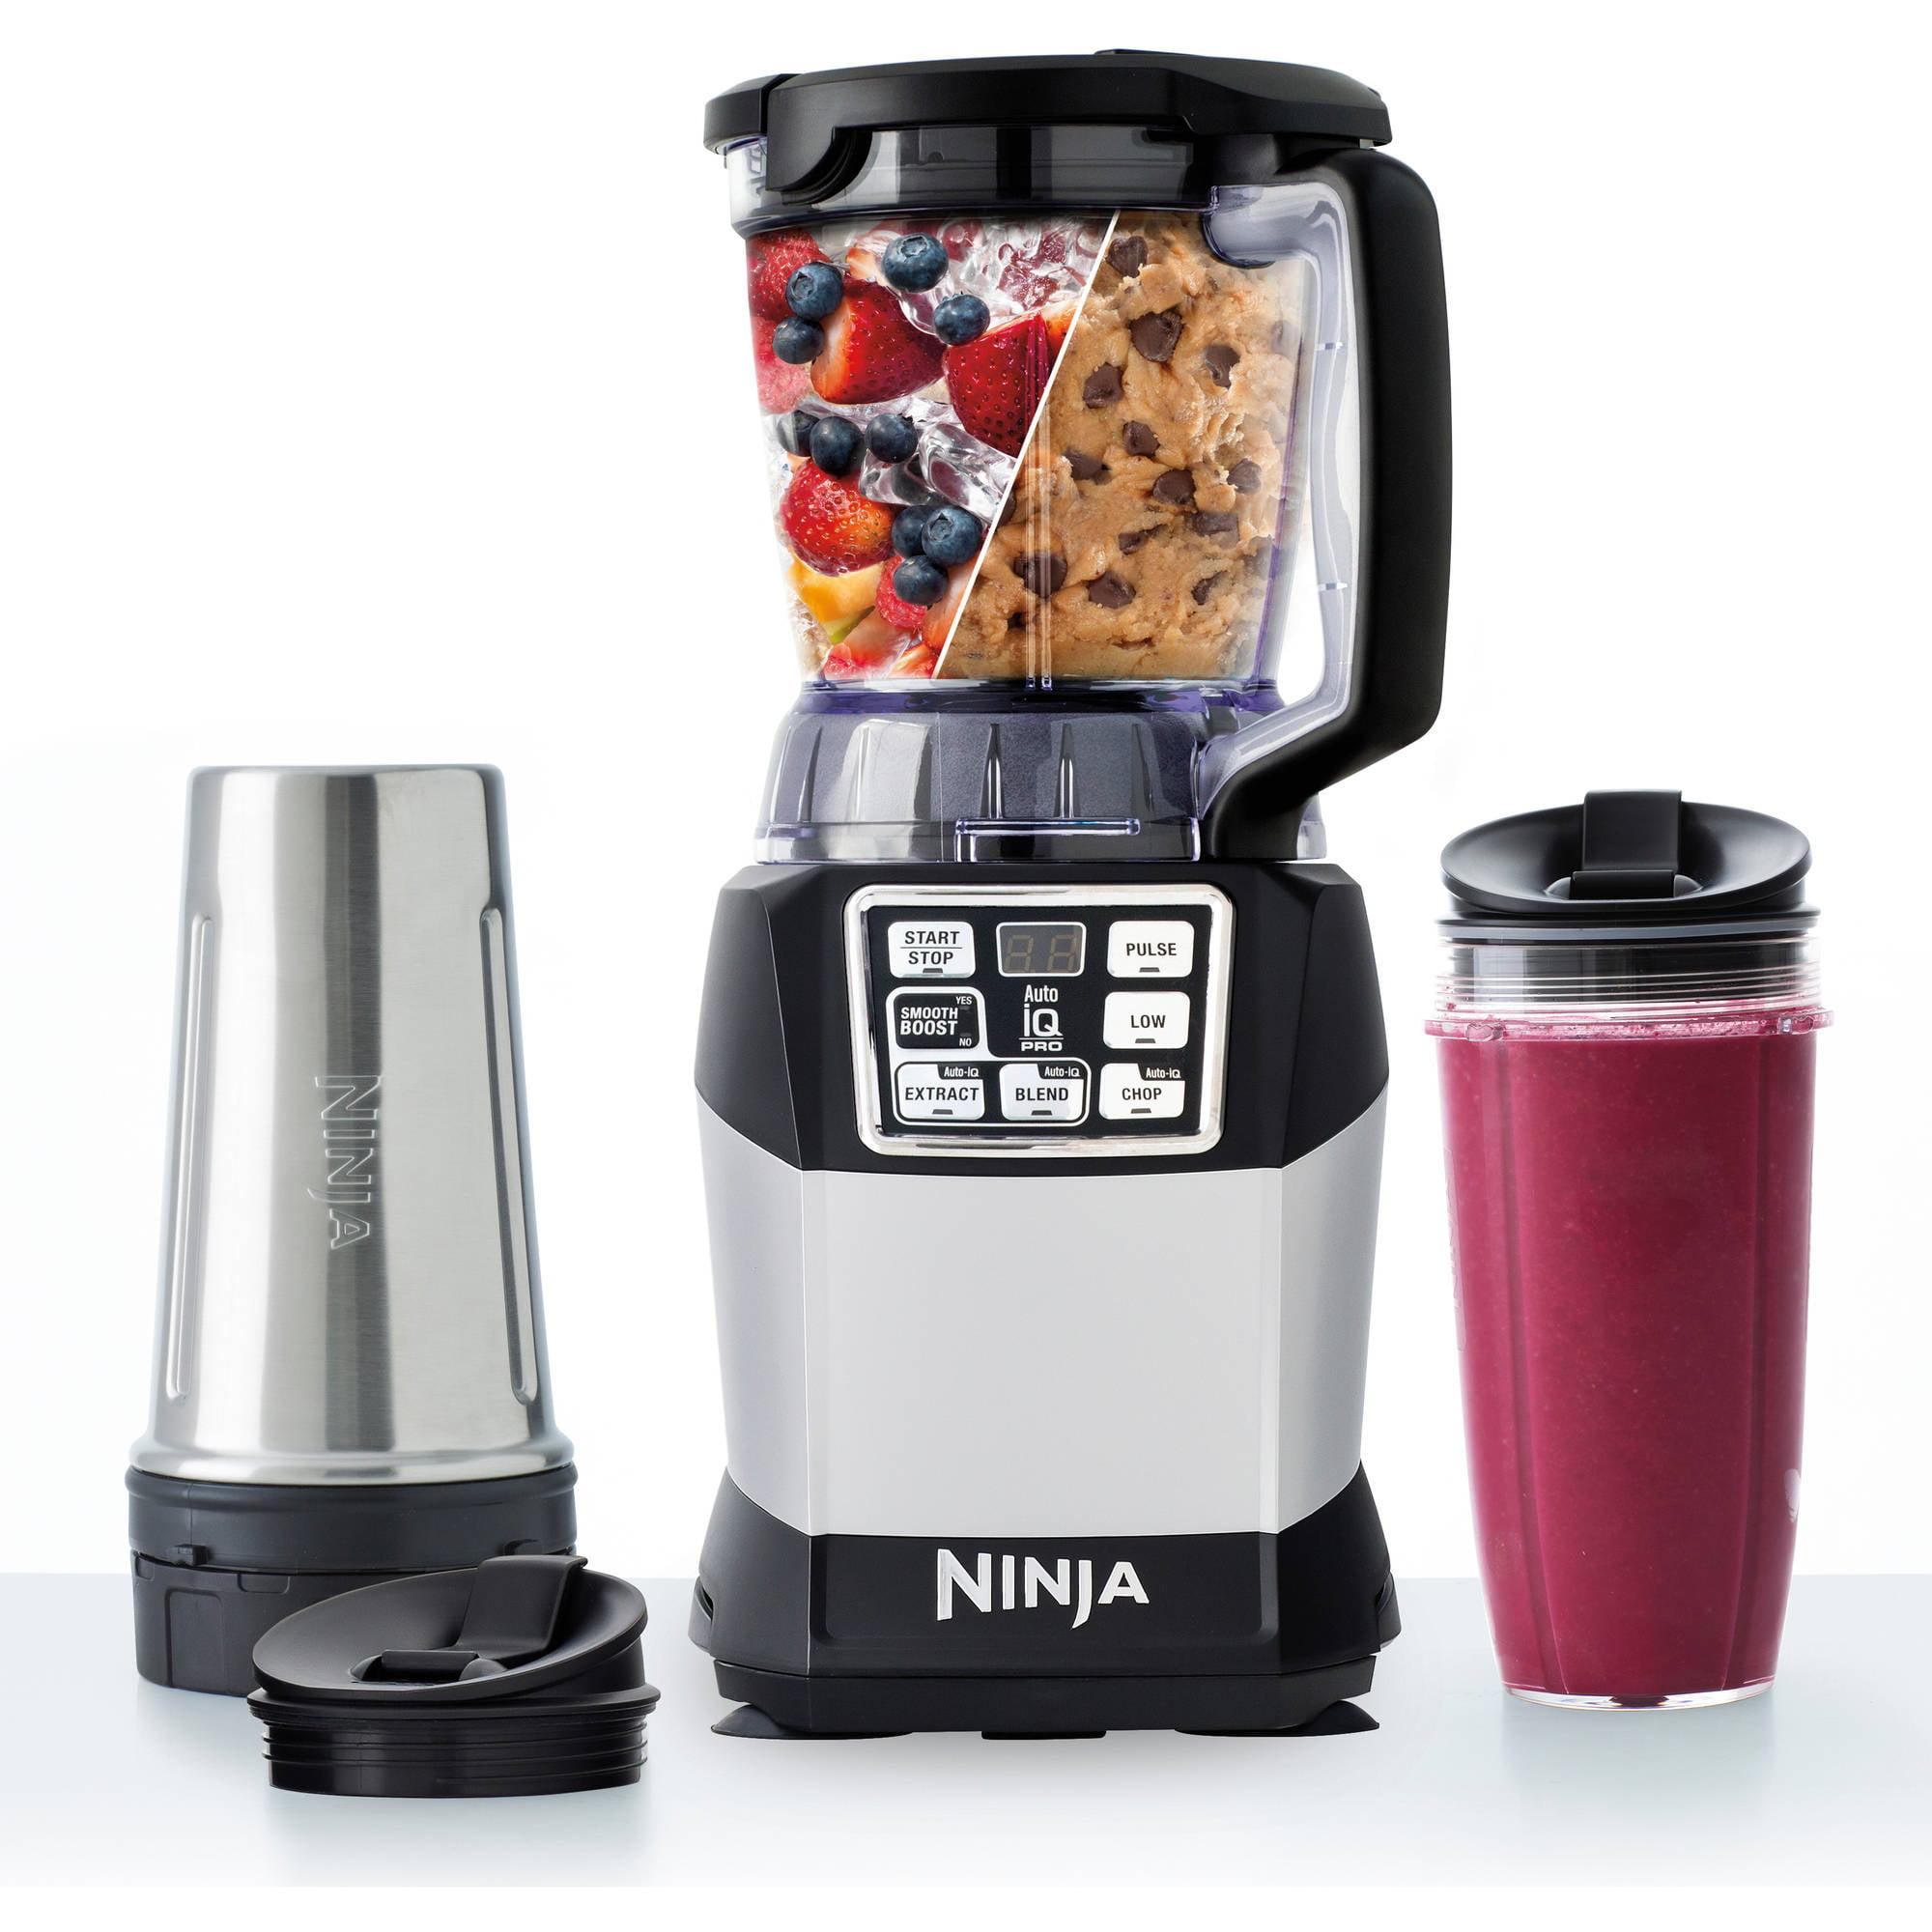 Nutri Ninja Auto-iQ Compact Blender System with Nutri Ninja Cups (BL492W)